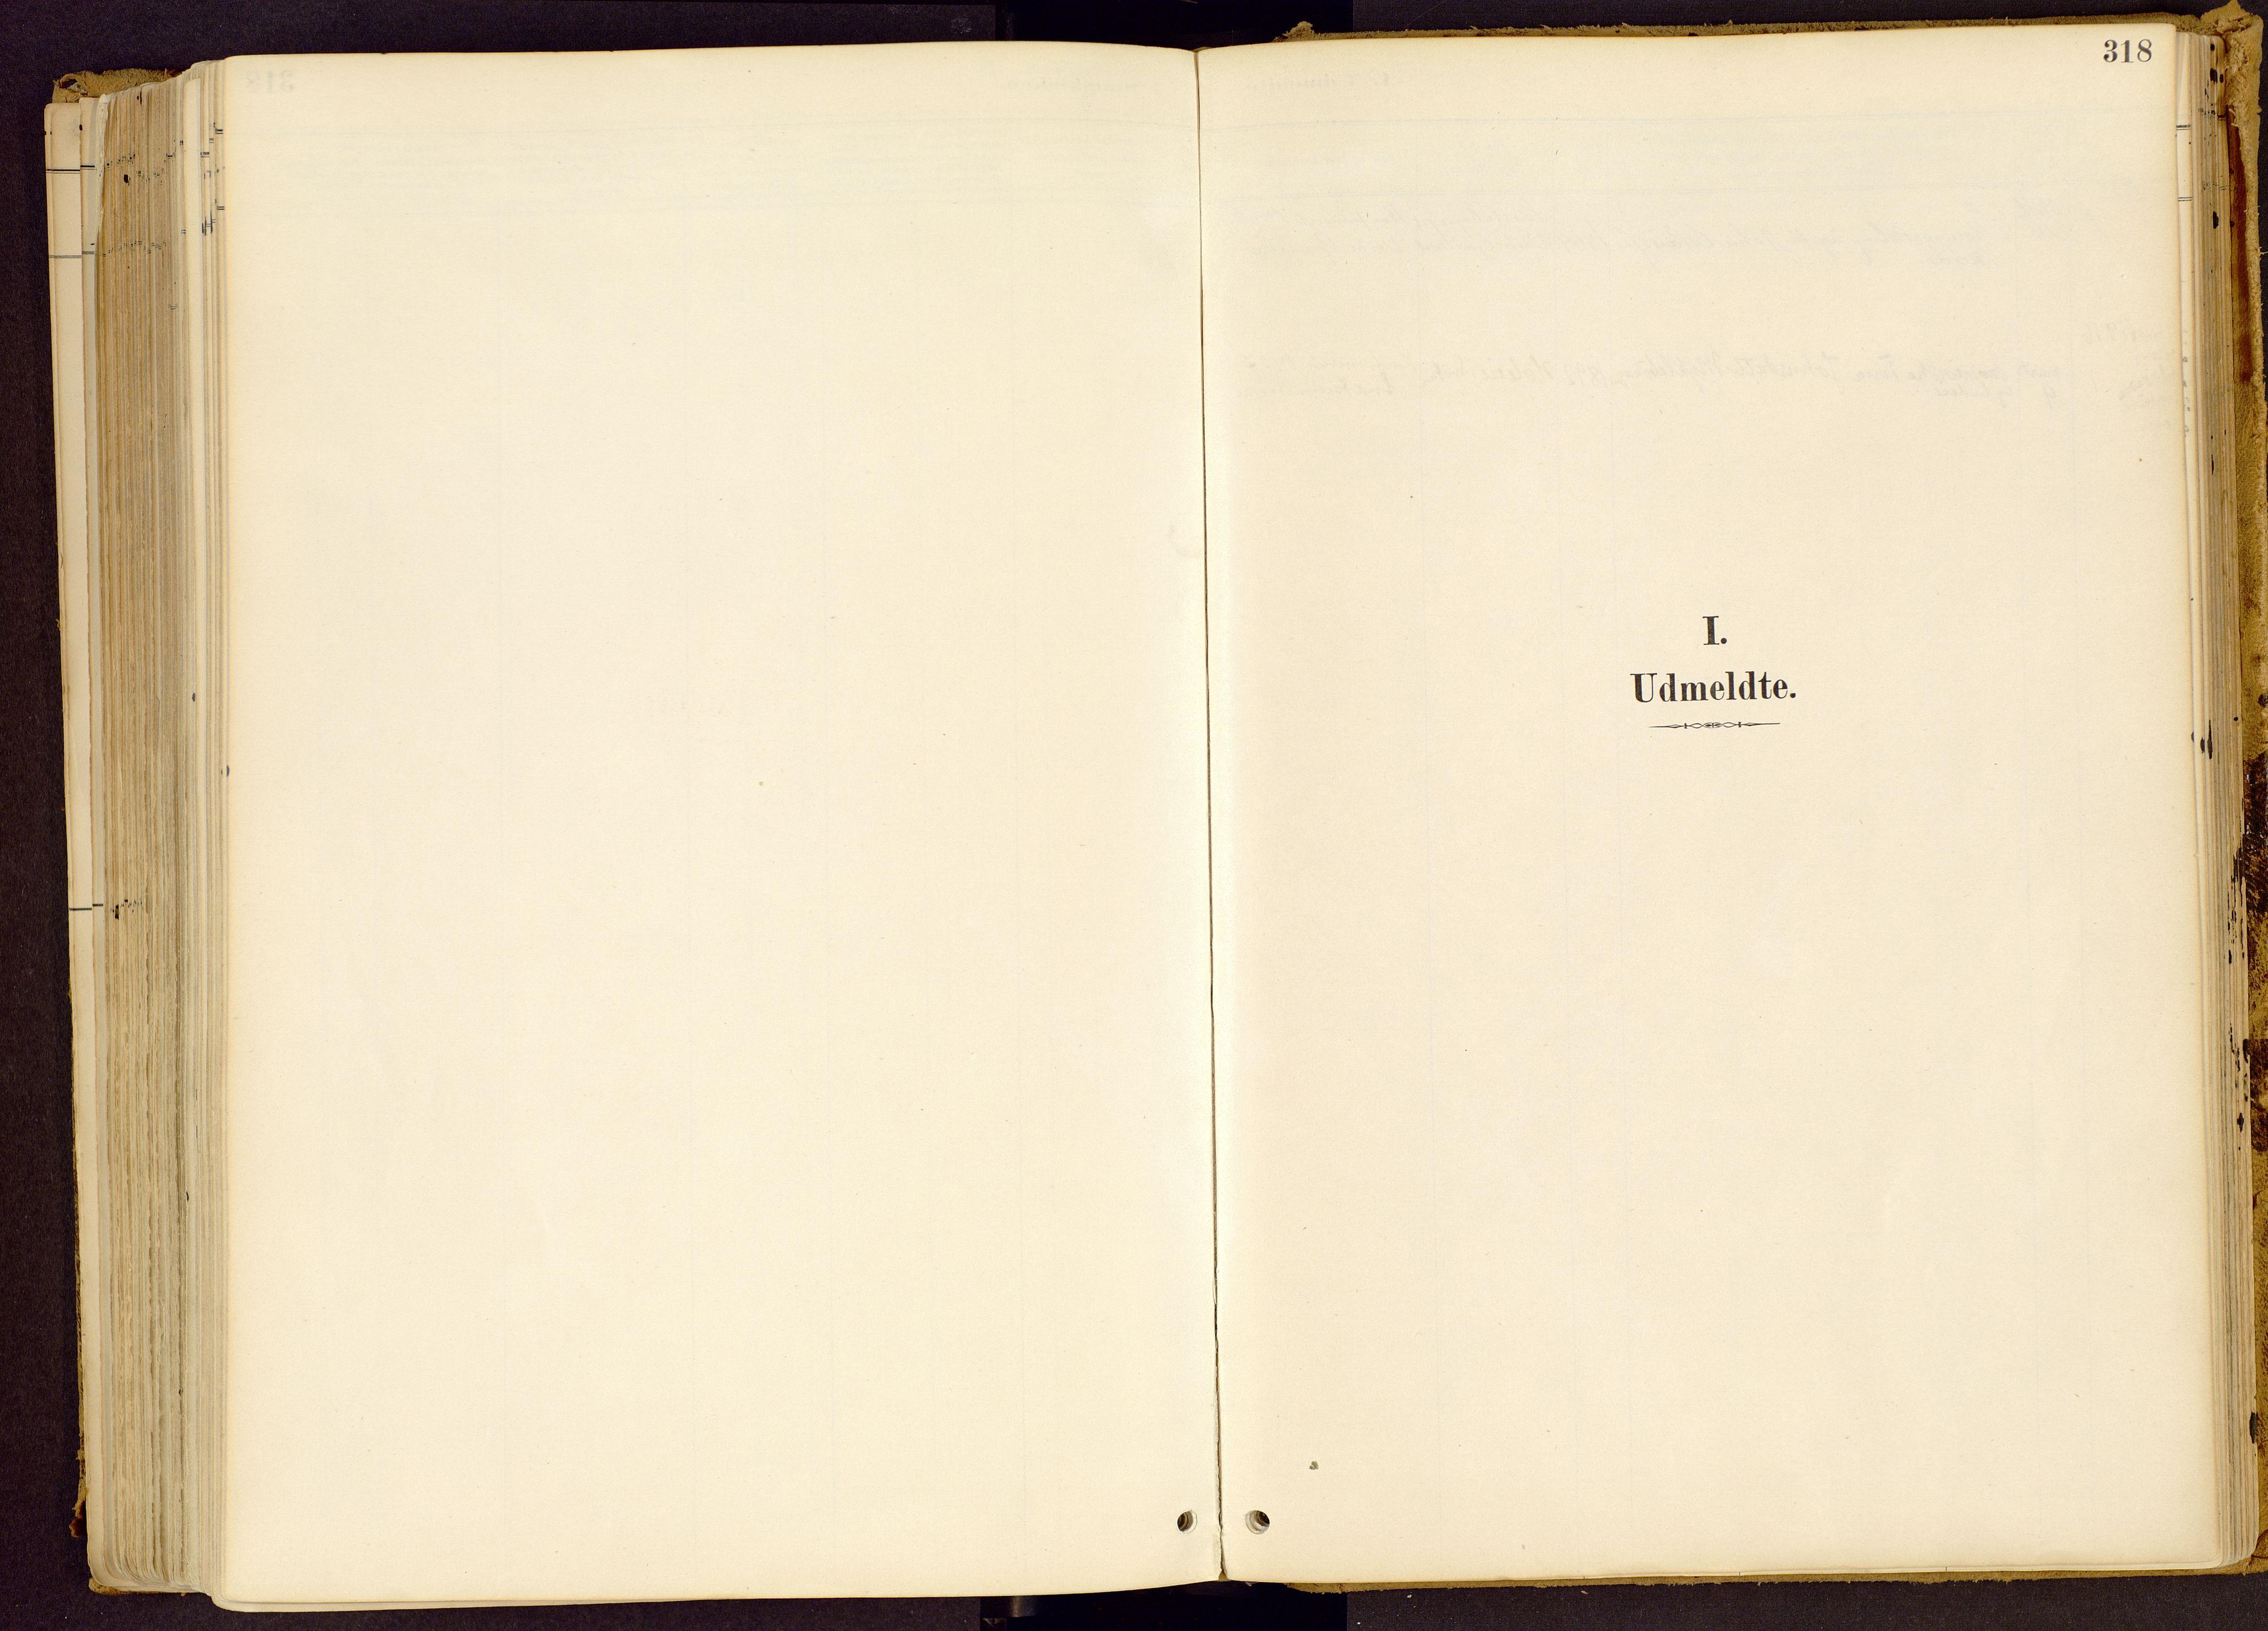 SAH, Vestre Gausdal prestekontor, Ministerialbok nr. 1, 1887-1914, s. 318